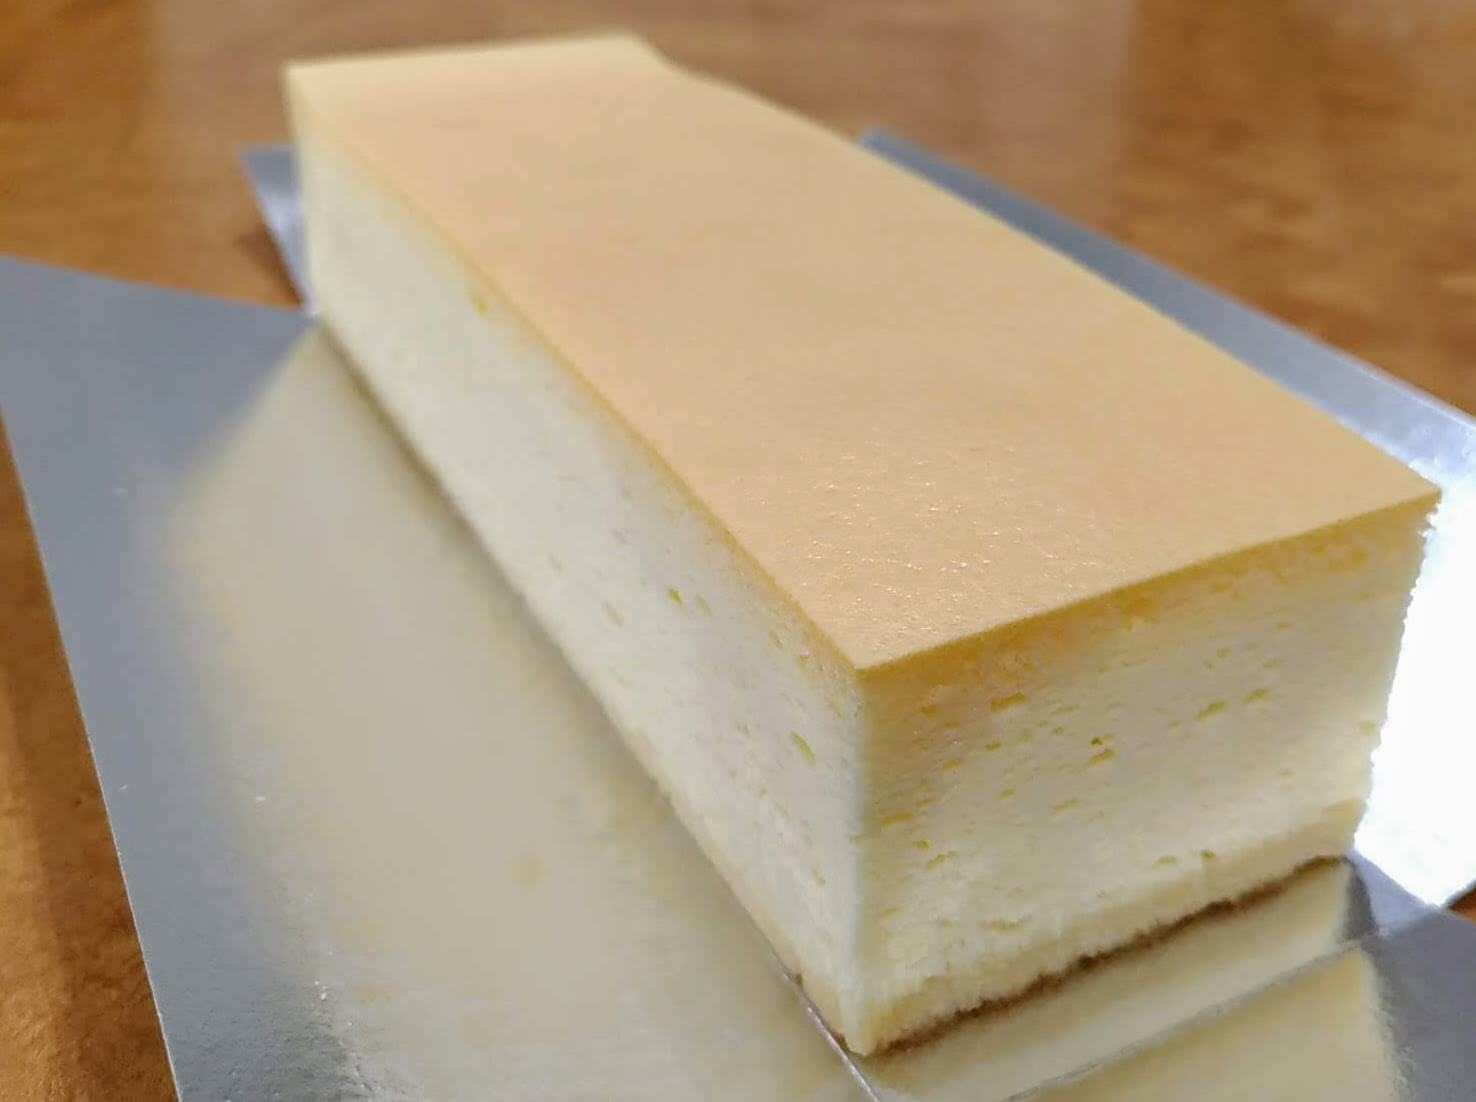 【CRIOLLO(クリオロ)】幻のチーズケーキ (6)